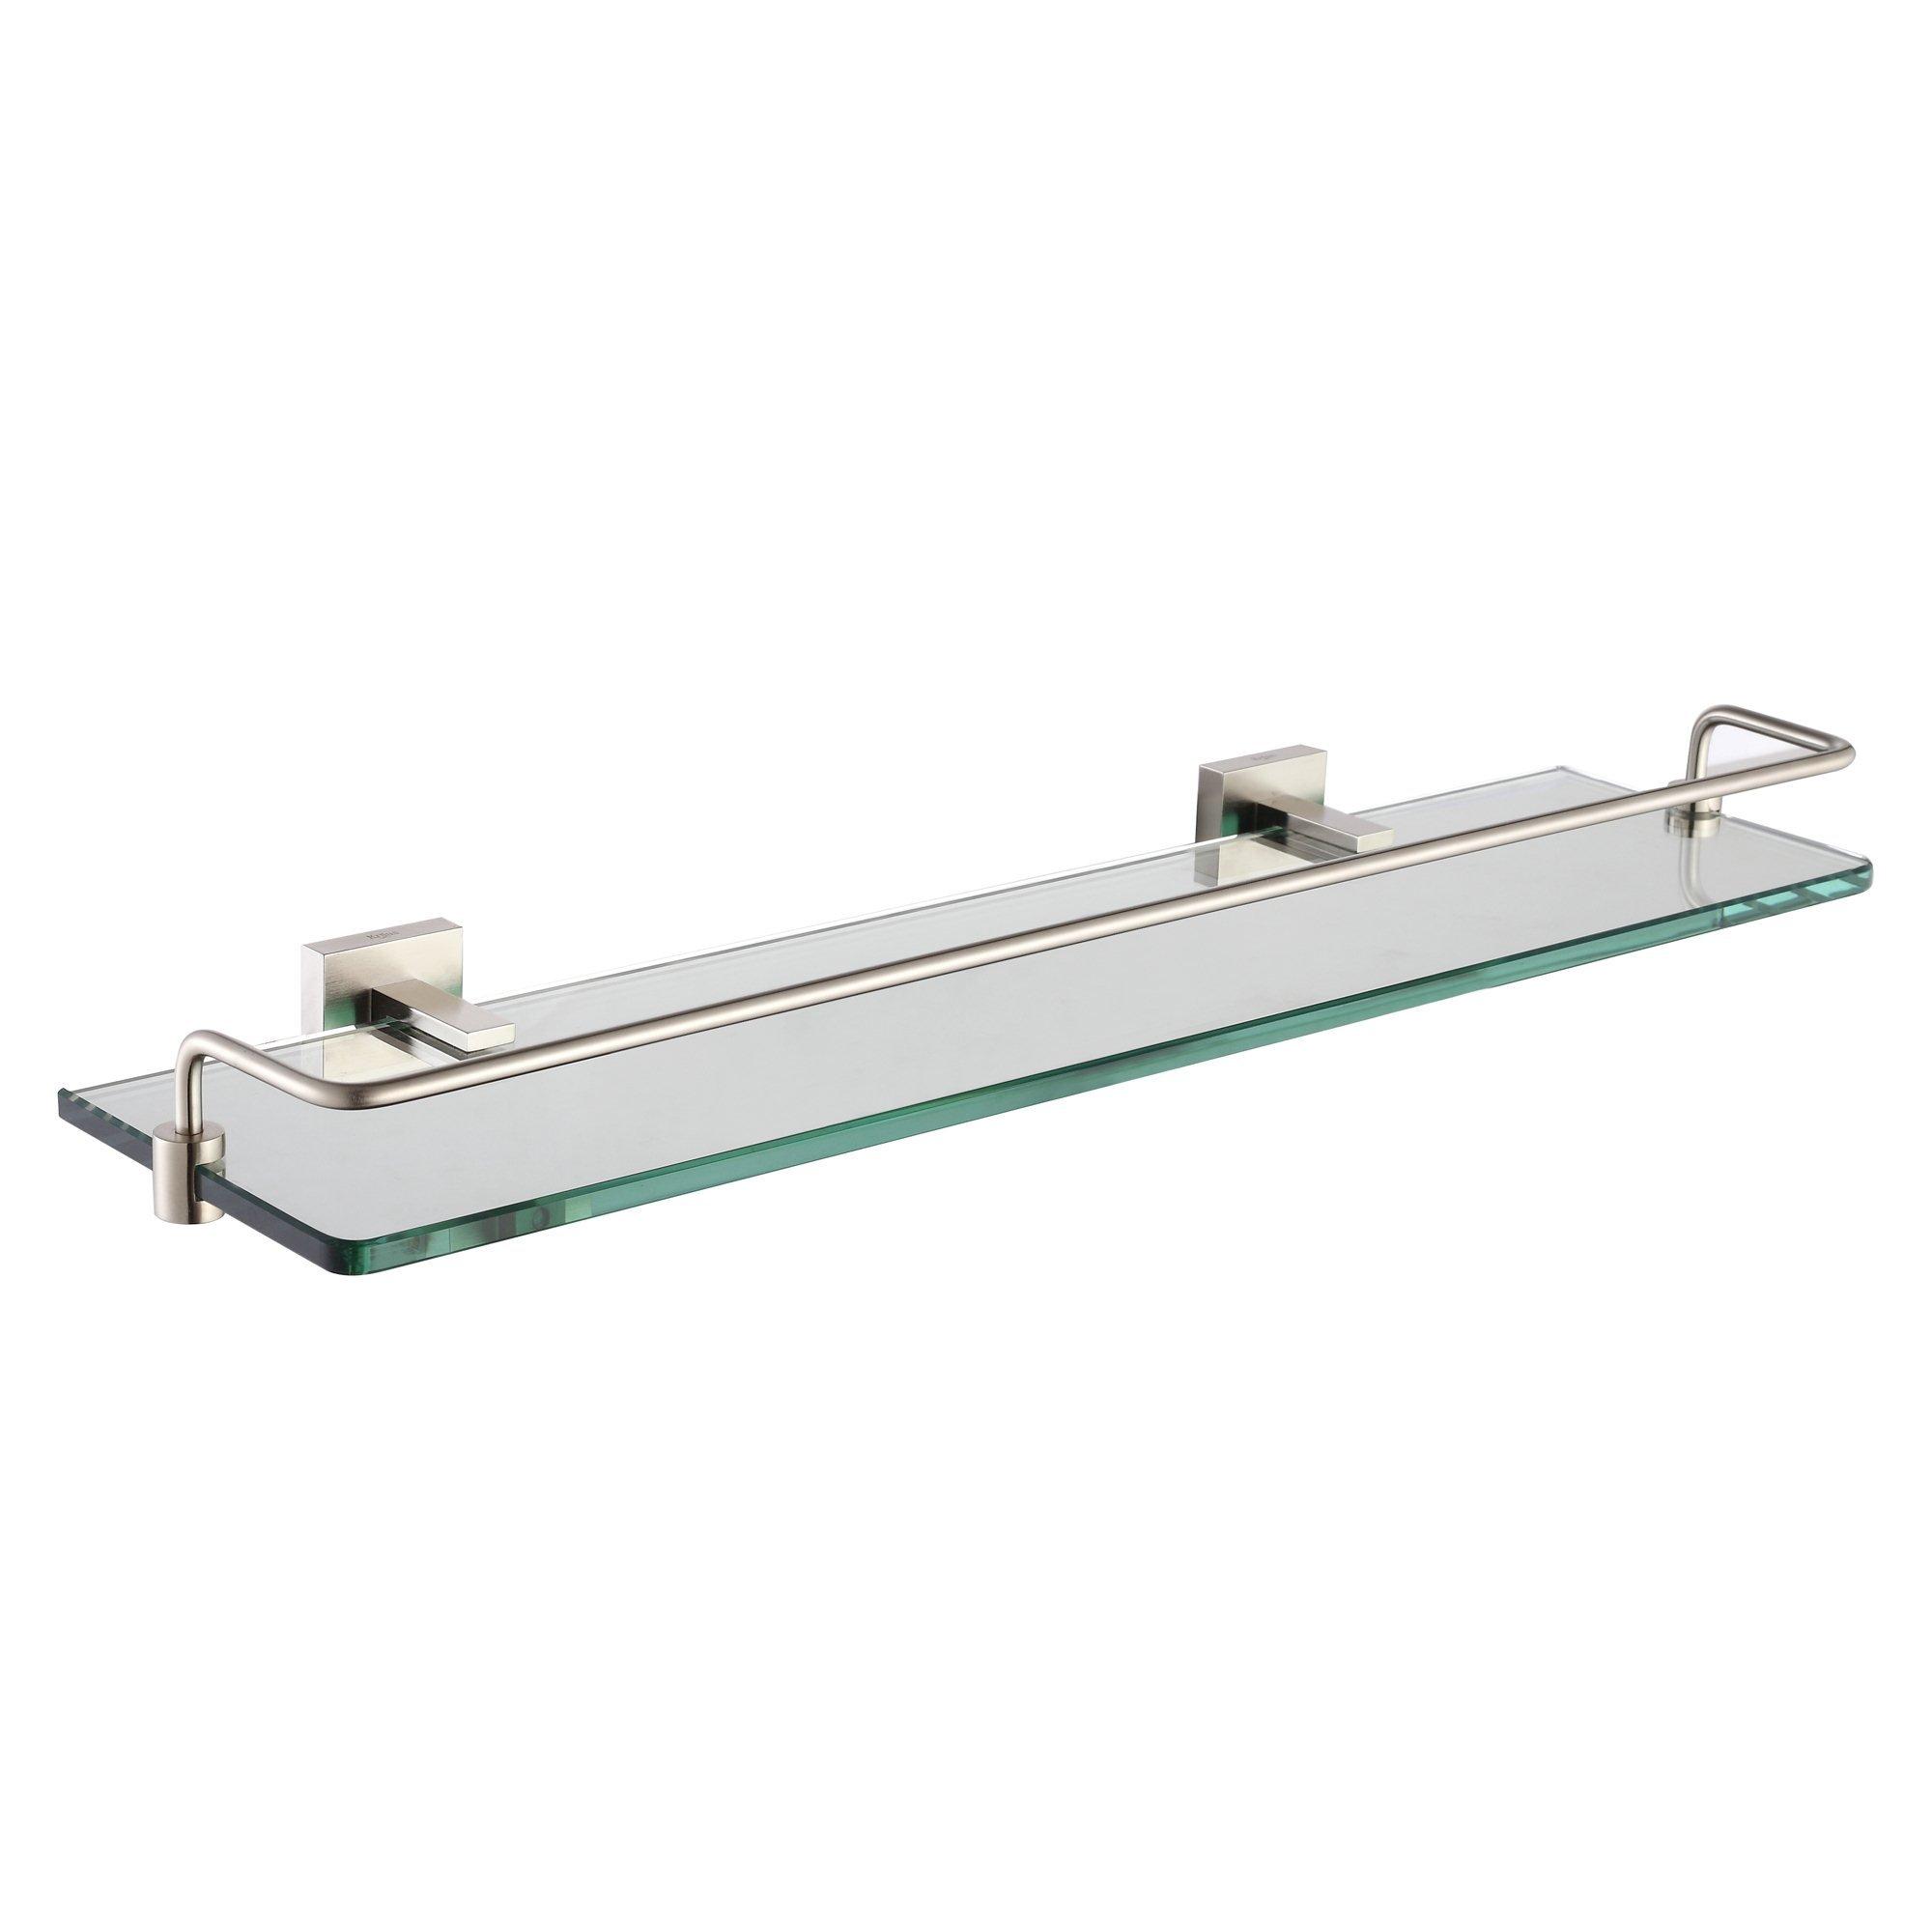 Kraus KEA-14445BN Aura Bathroom Accessories - Shelf with Railing Brushed Nickel